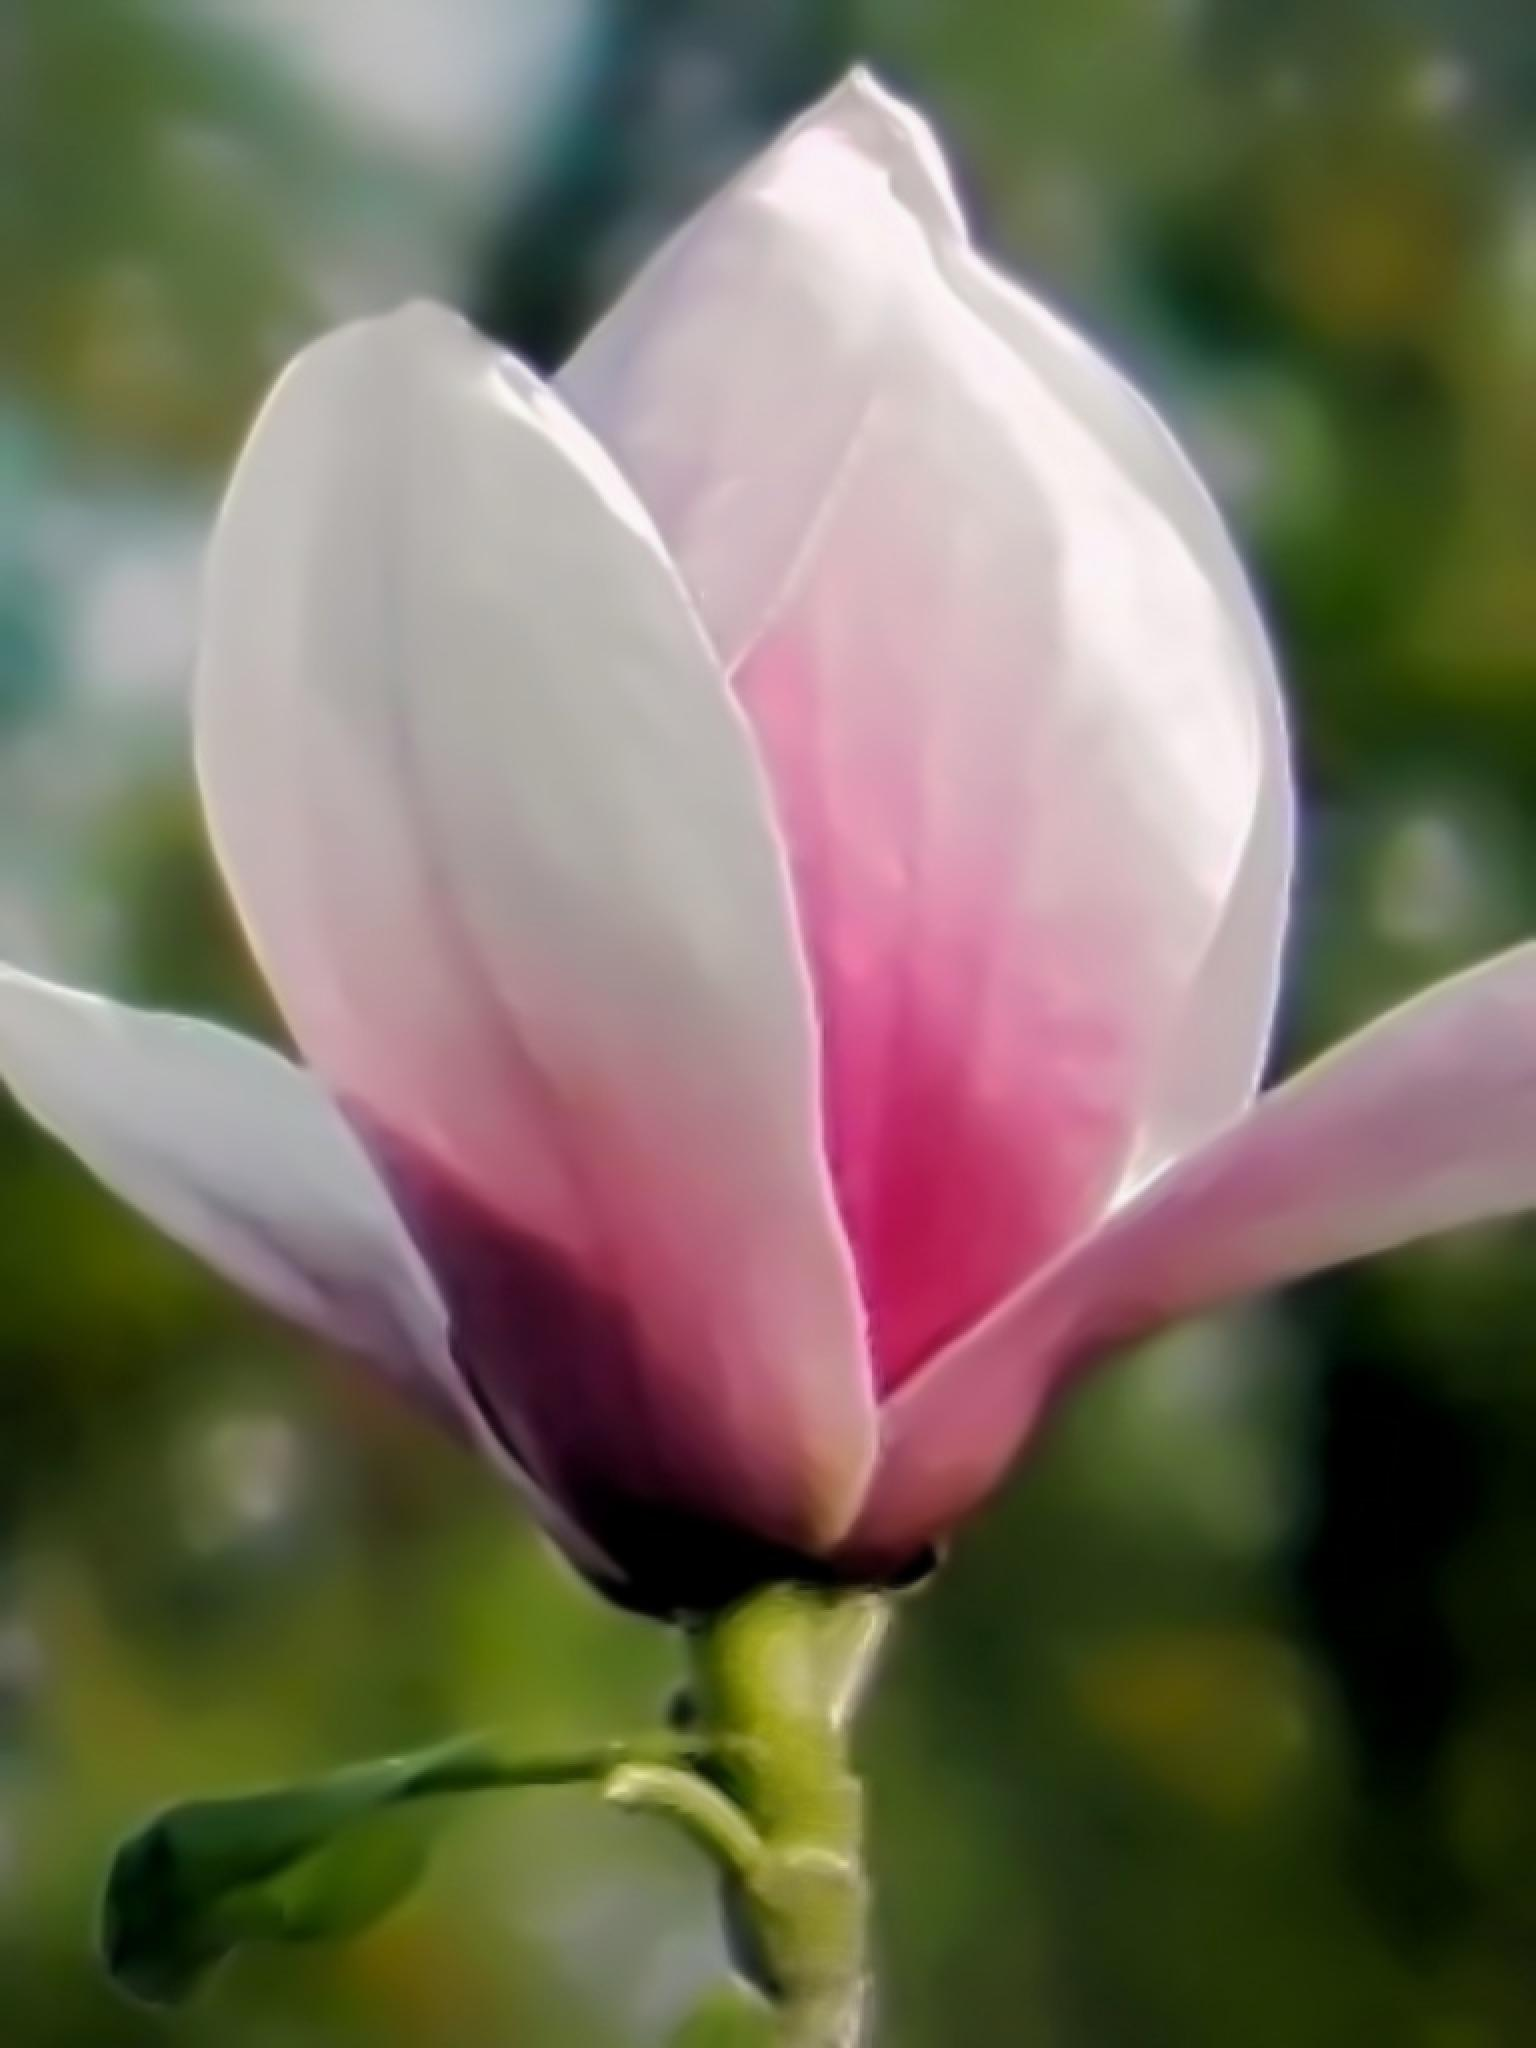 Tulip Tree Flower by Darlene Eastin